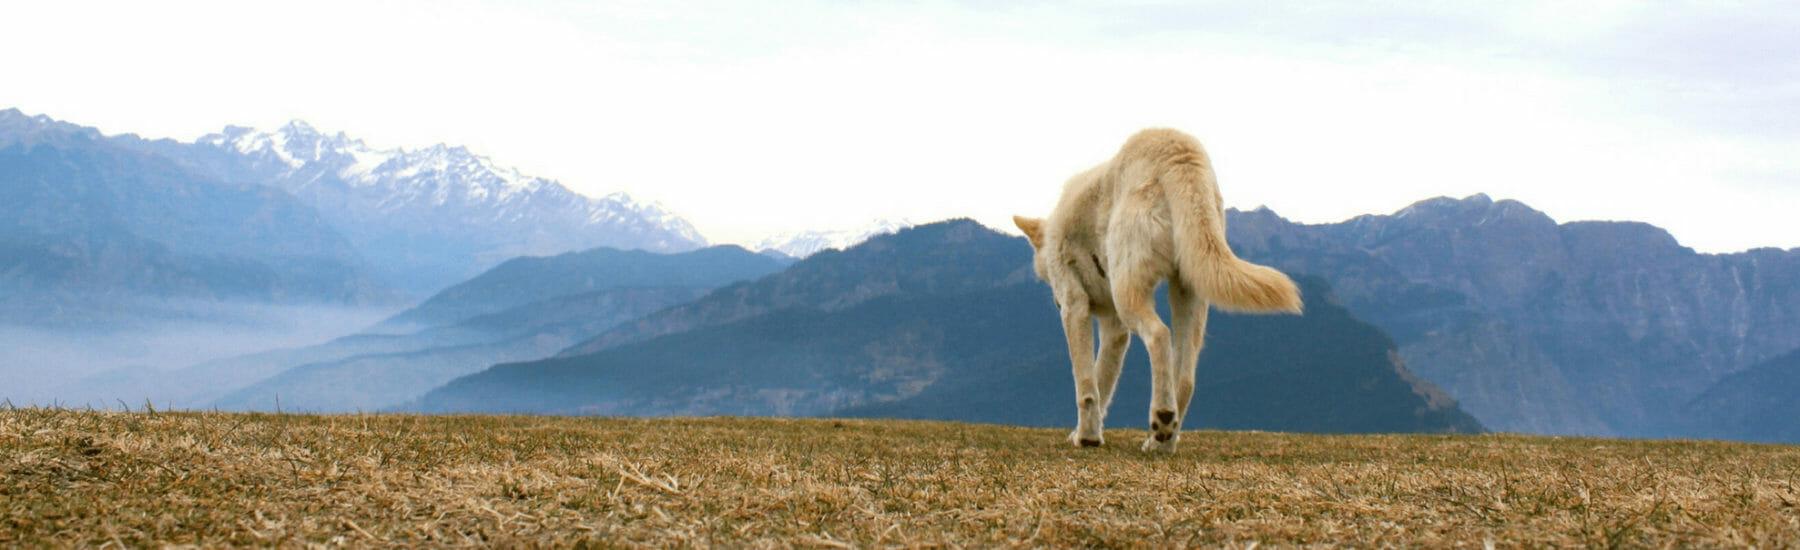 Golden dog walking away from camera towards mountains